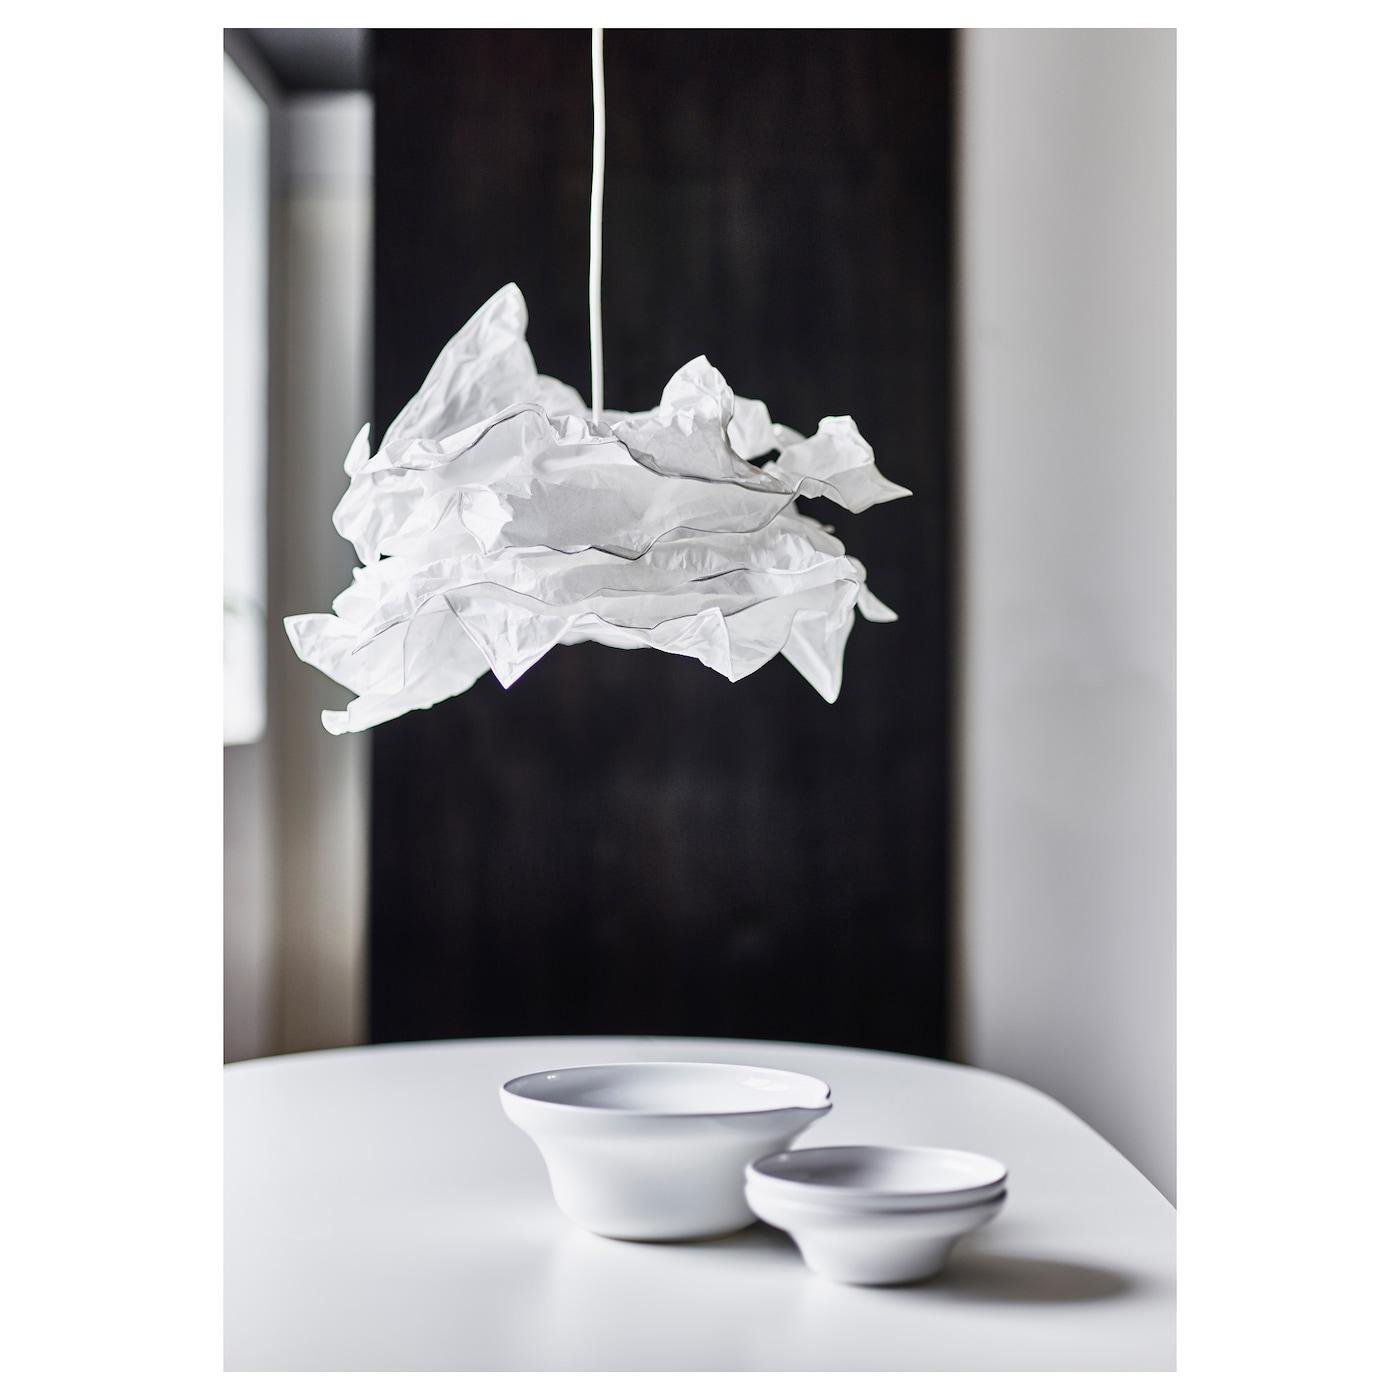 krusning abat jour suspension blanc 43 cm ikea. Black Bedroom Furniture Sets. Home Design Ideas